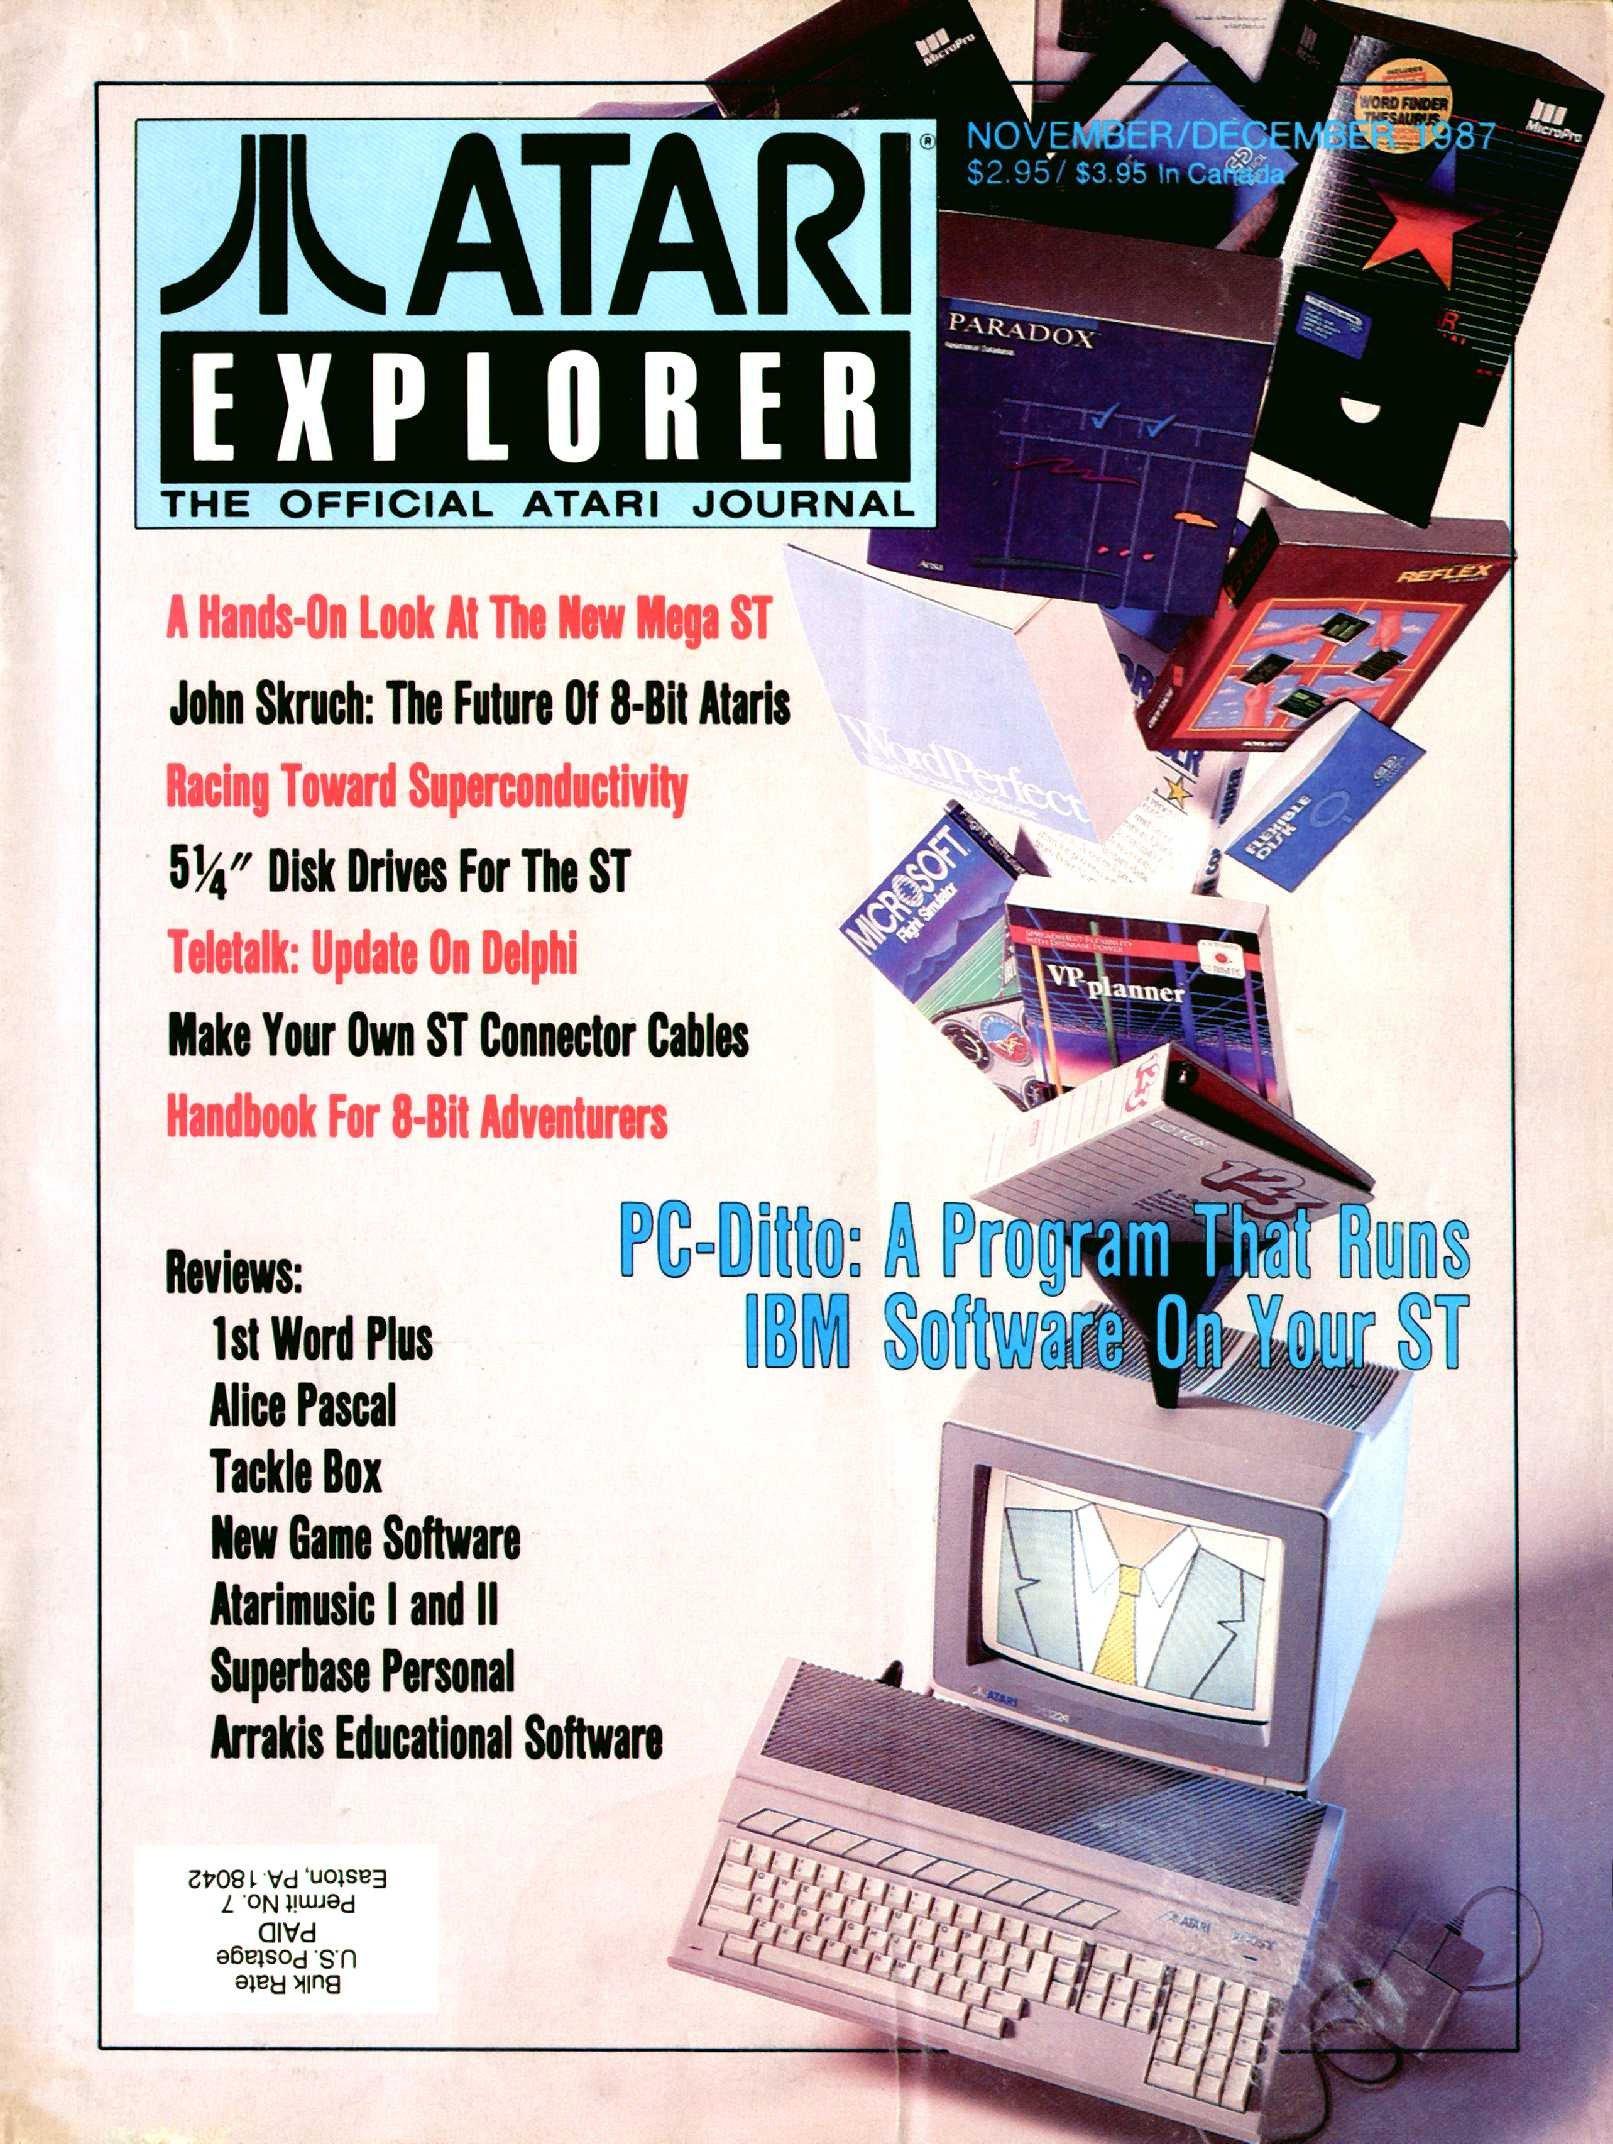 Atari Explorer Issue 11 (November / December 1987)